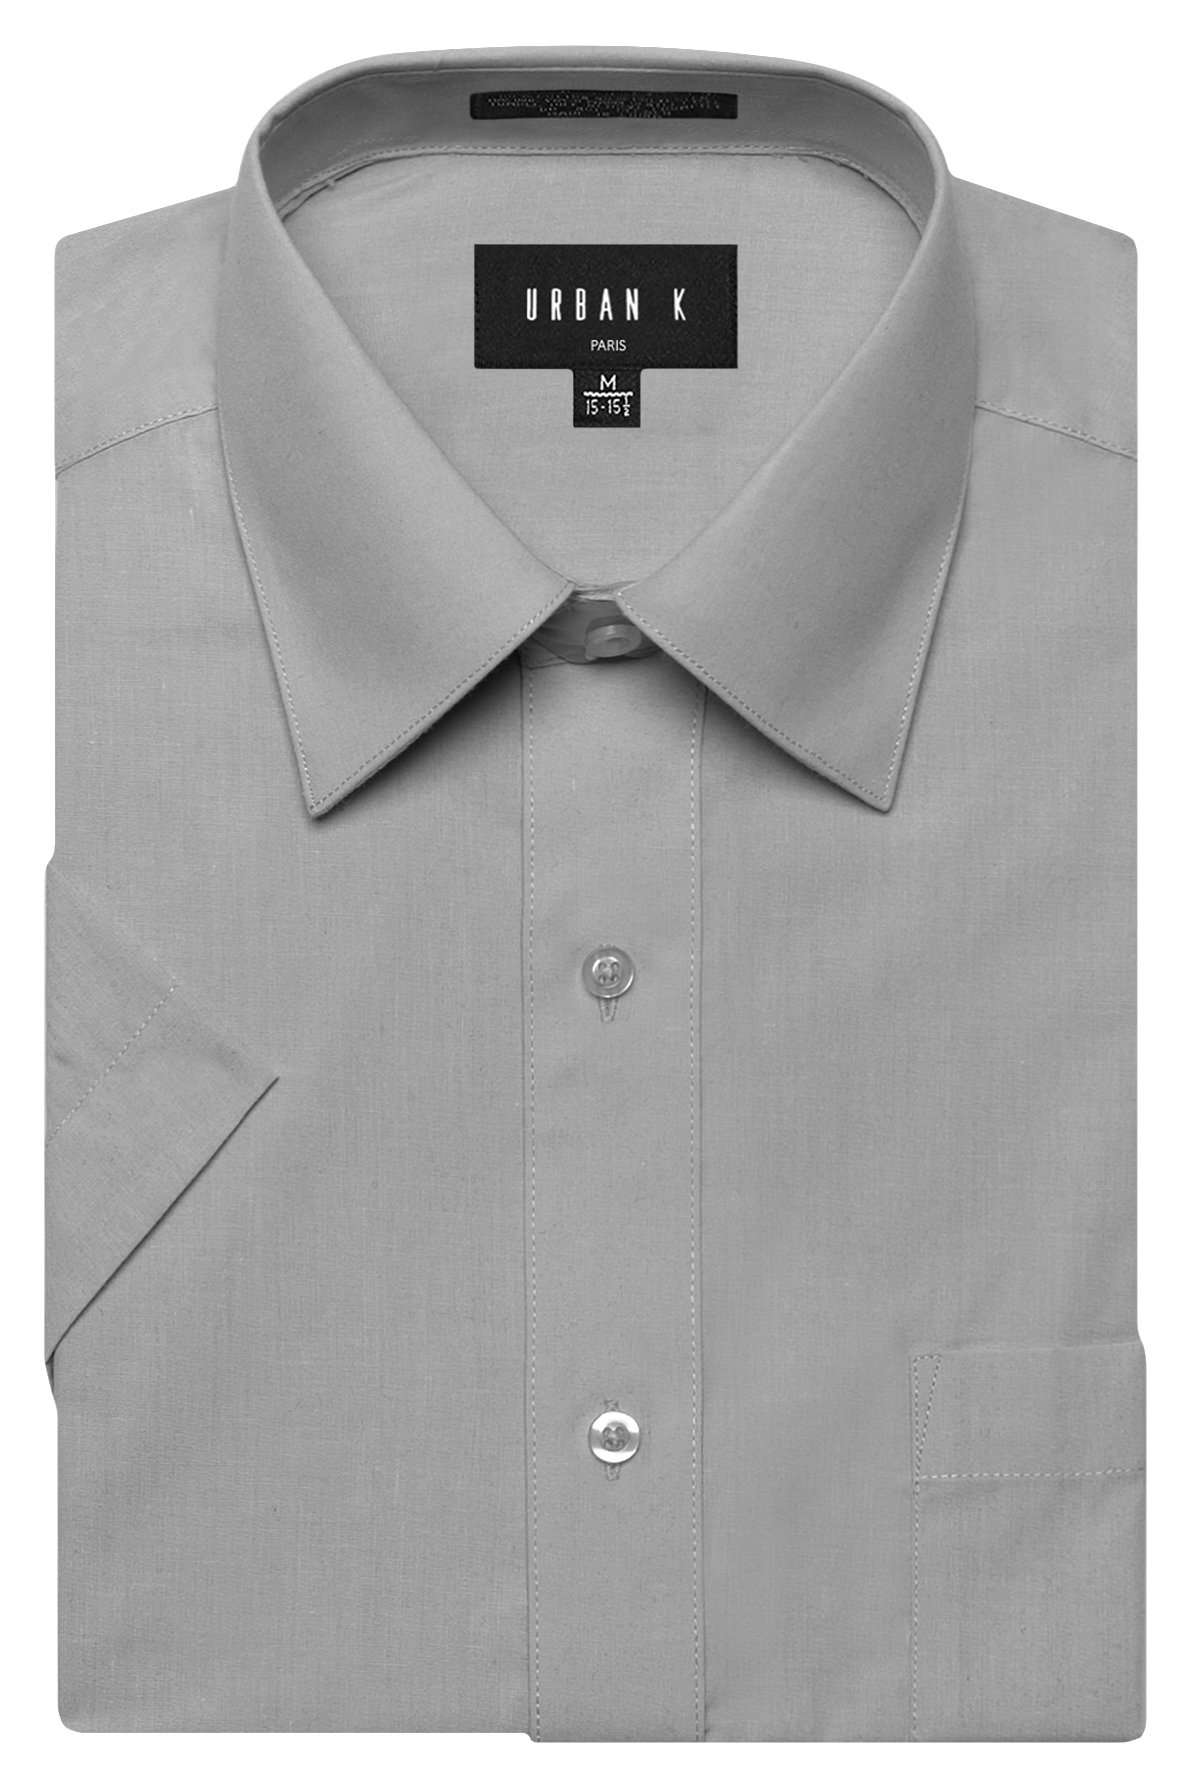 URBAN K Men's Classic Fit Solid Formal Collar Short Sleeve Dress Shirts Regular & Plus Size, Ubk-light Grey, 2XL/18-18.5 N